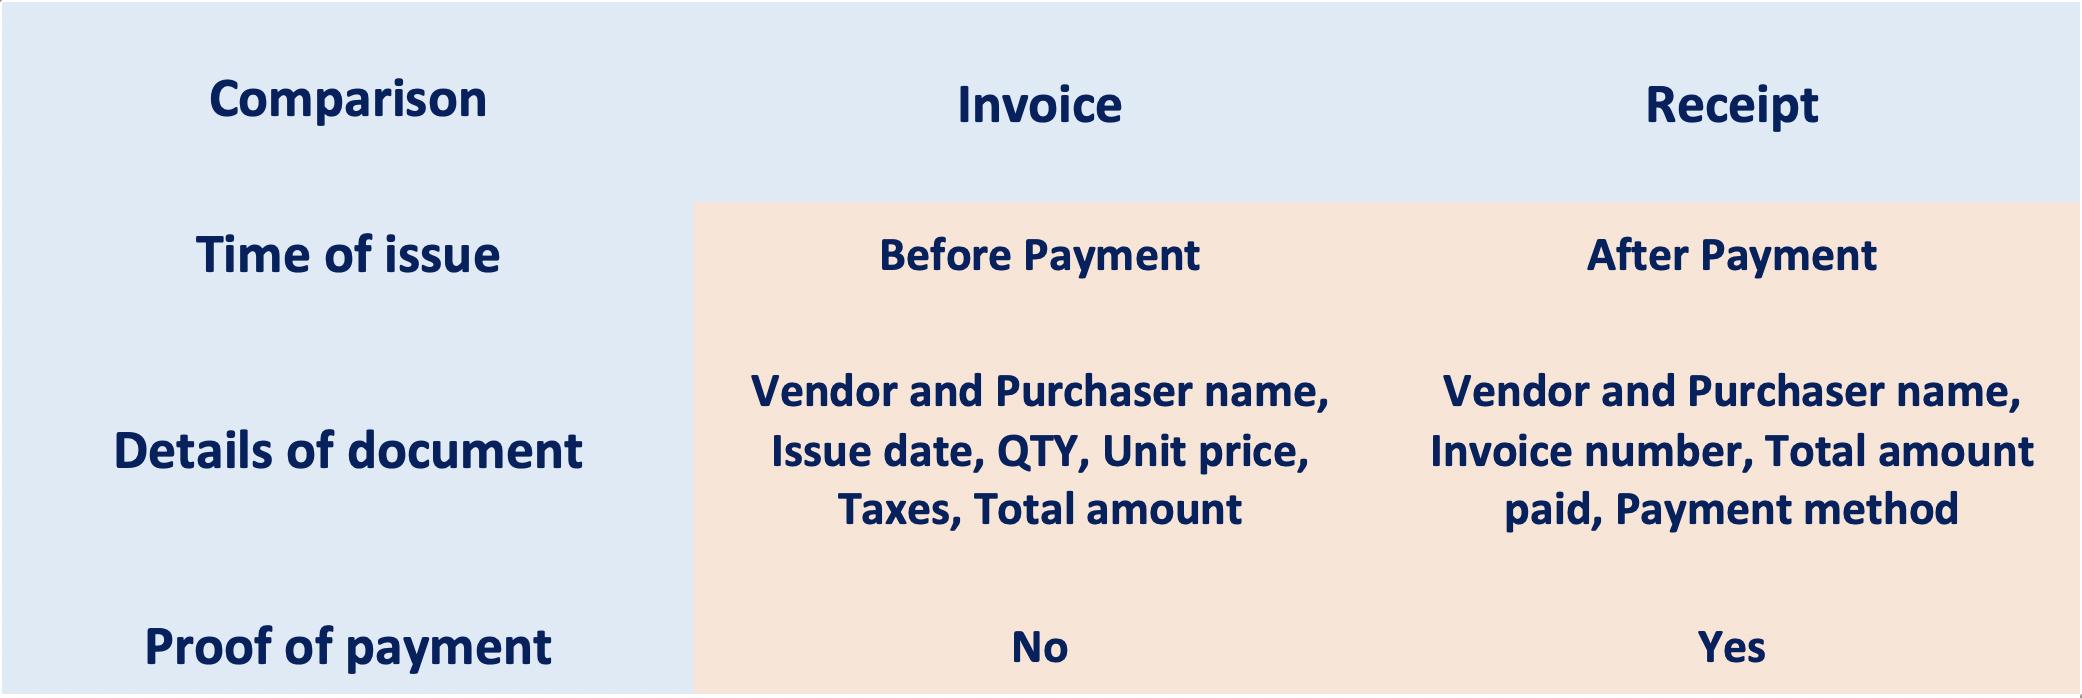 Invoice vs receipt